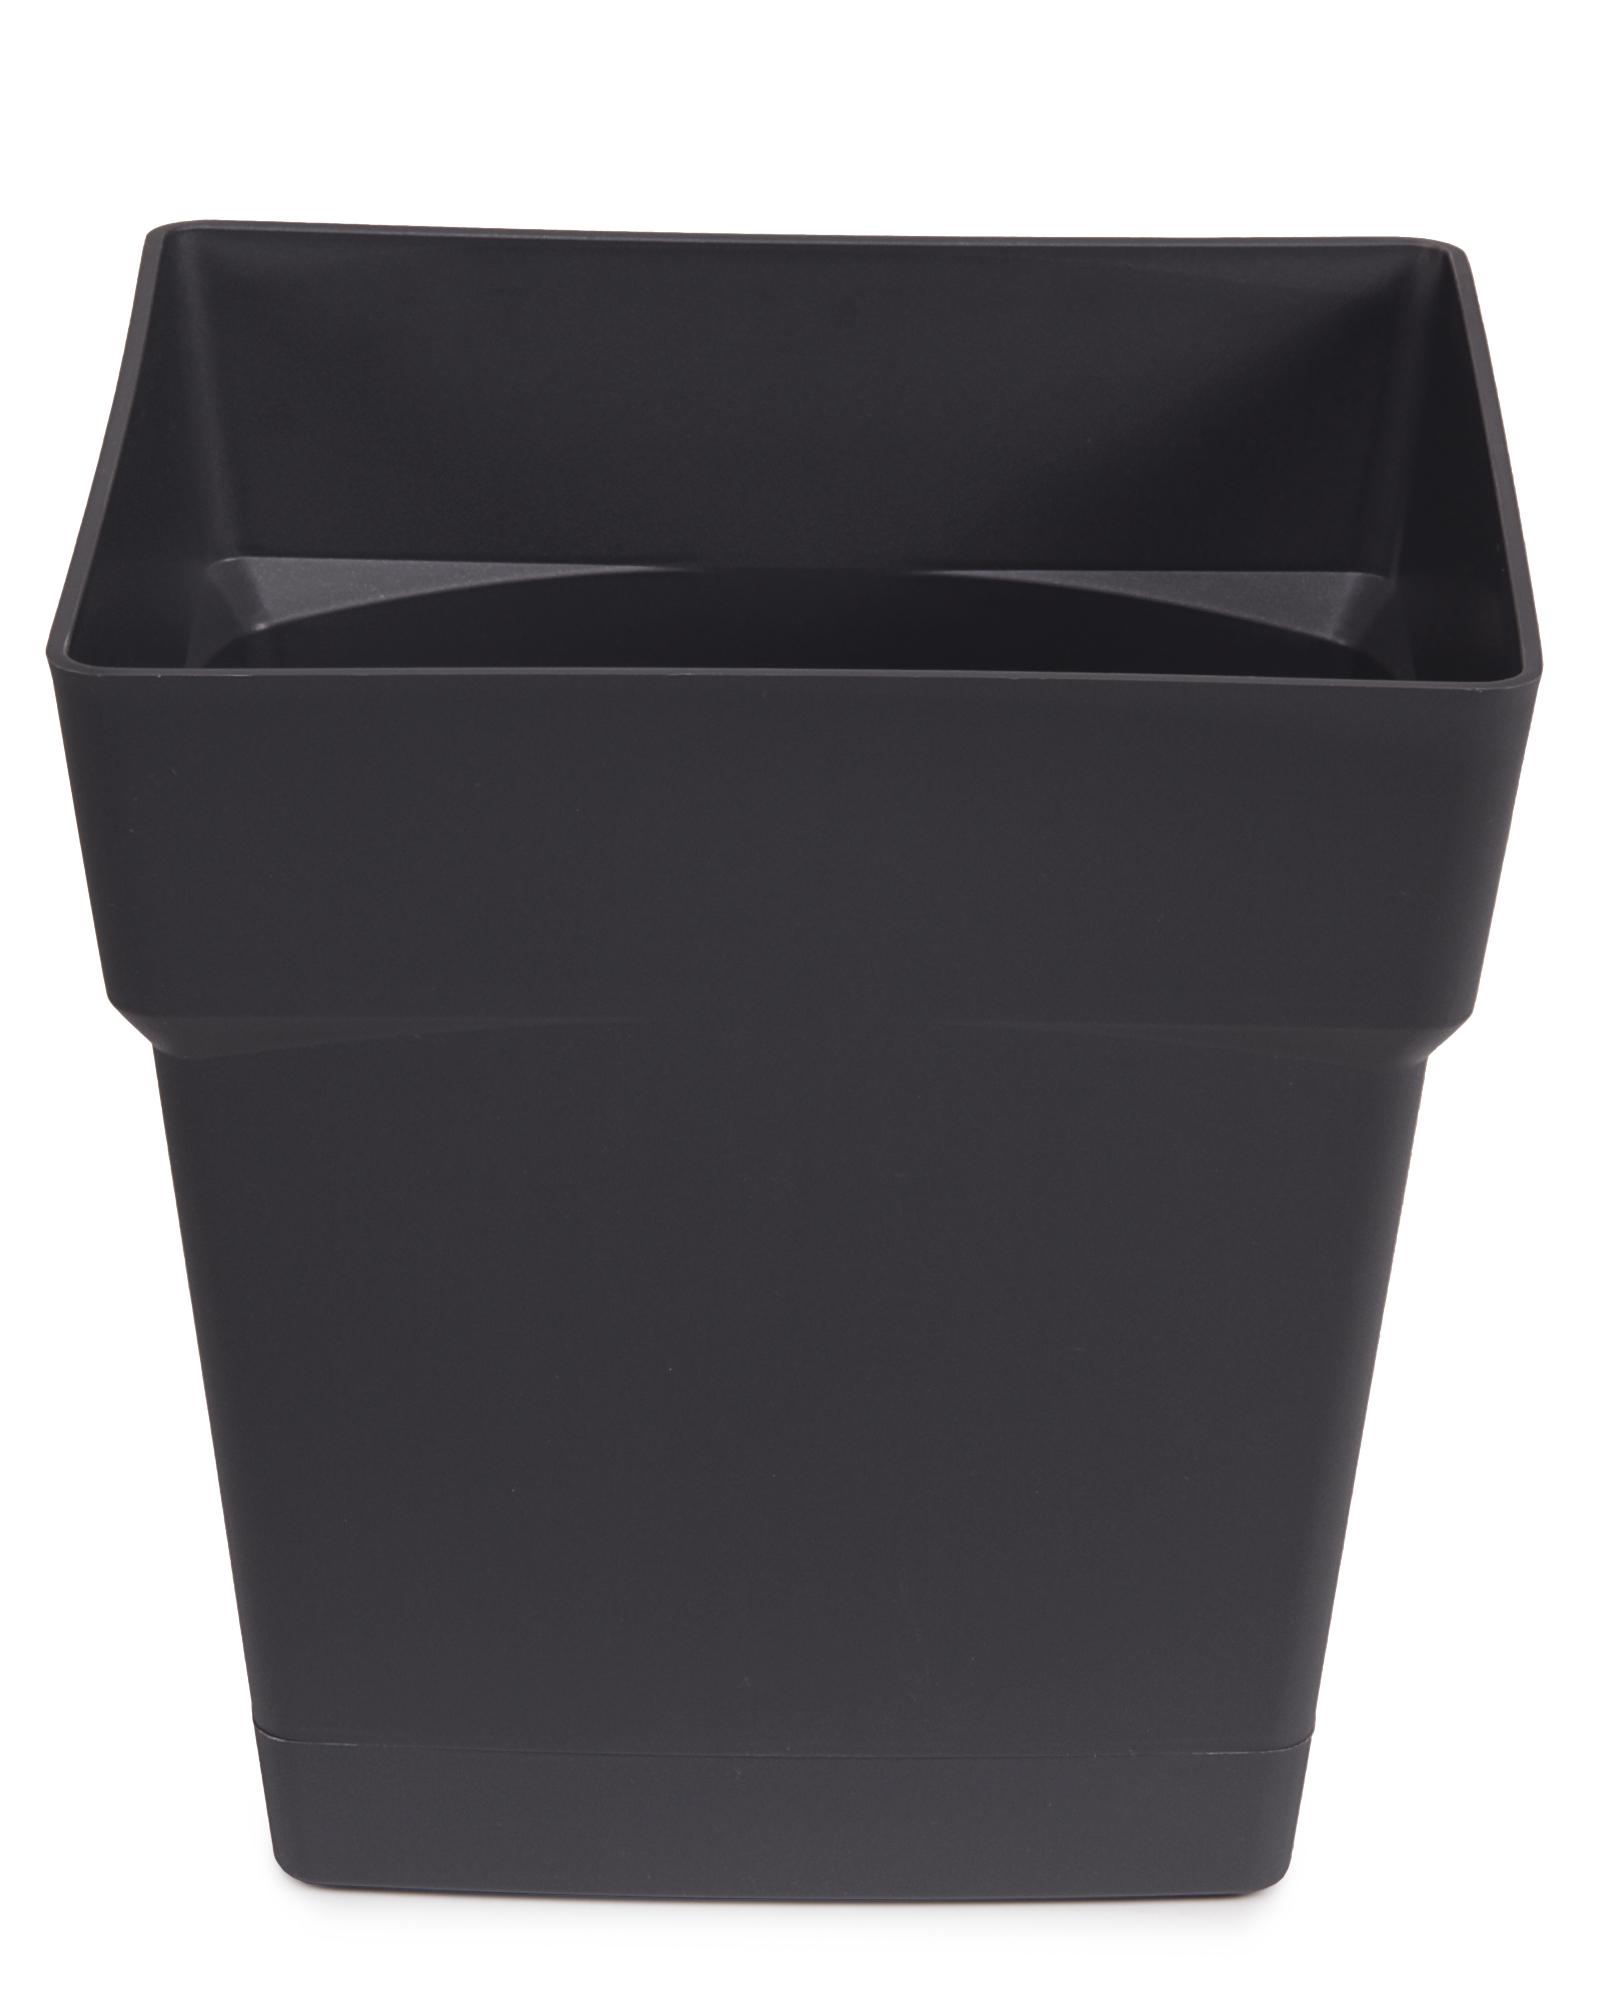 ondis24 blumentopf toskana 10 l g nstig online kaufen. Black Bedroom Furniture Sets. Home Design Ideas